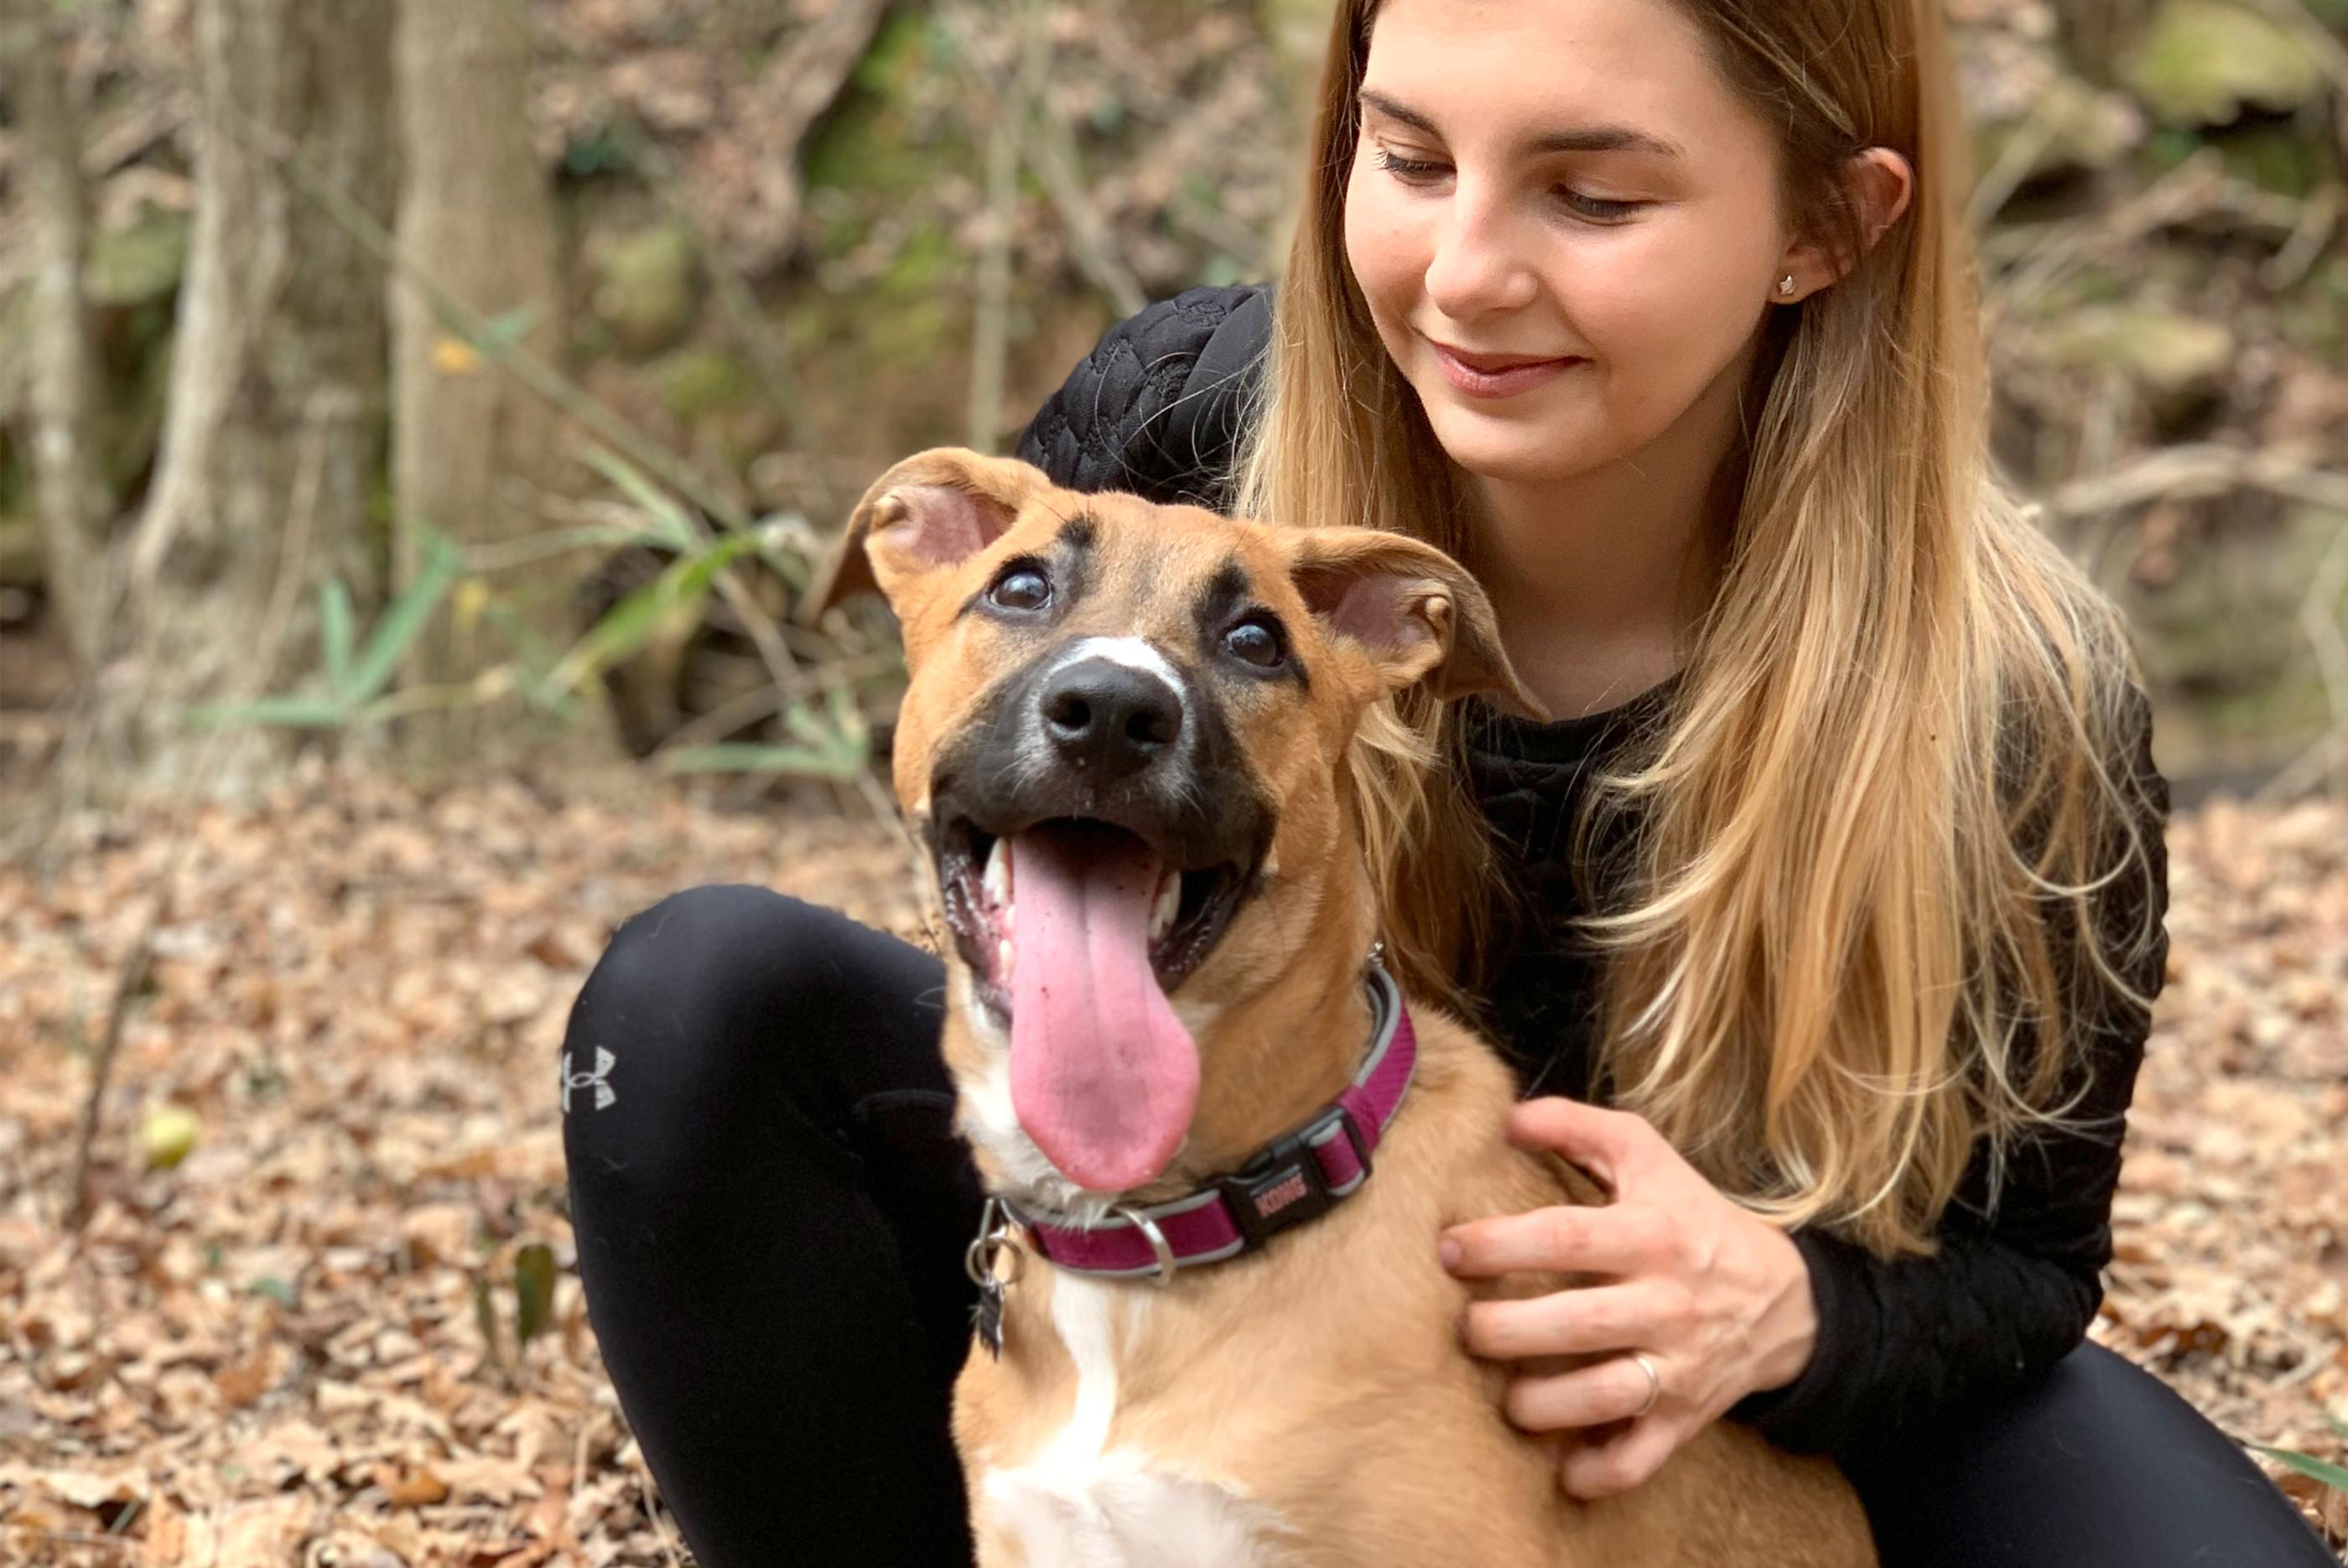 Animal rescue image